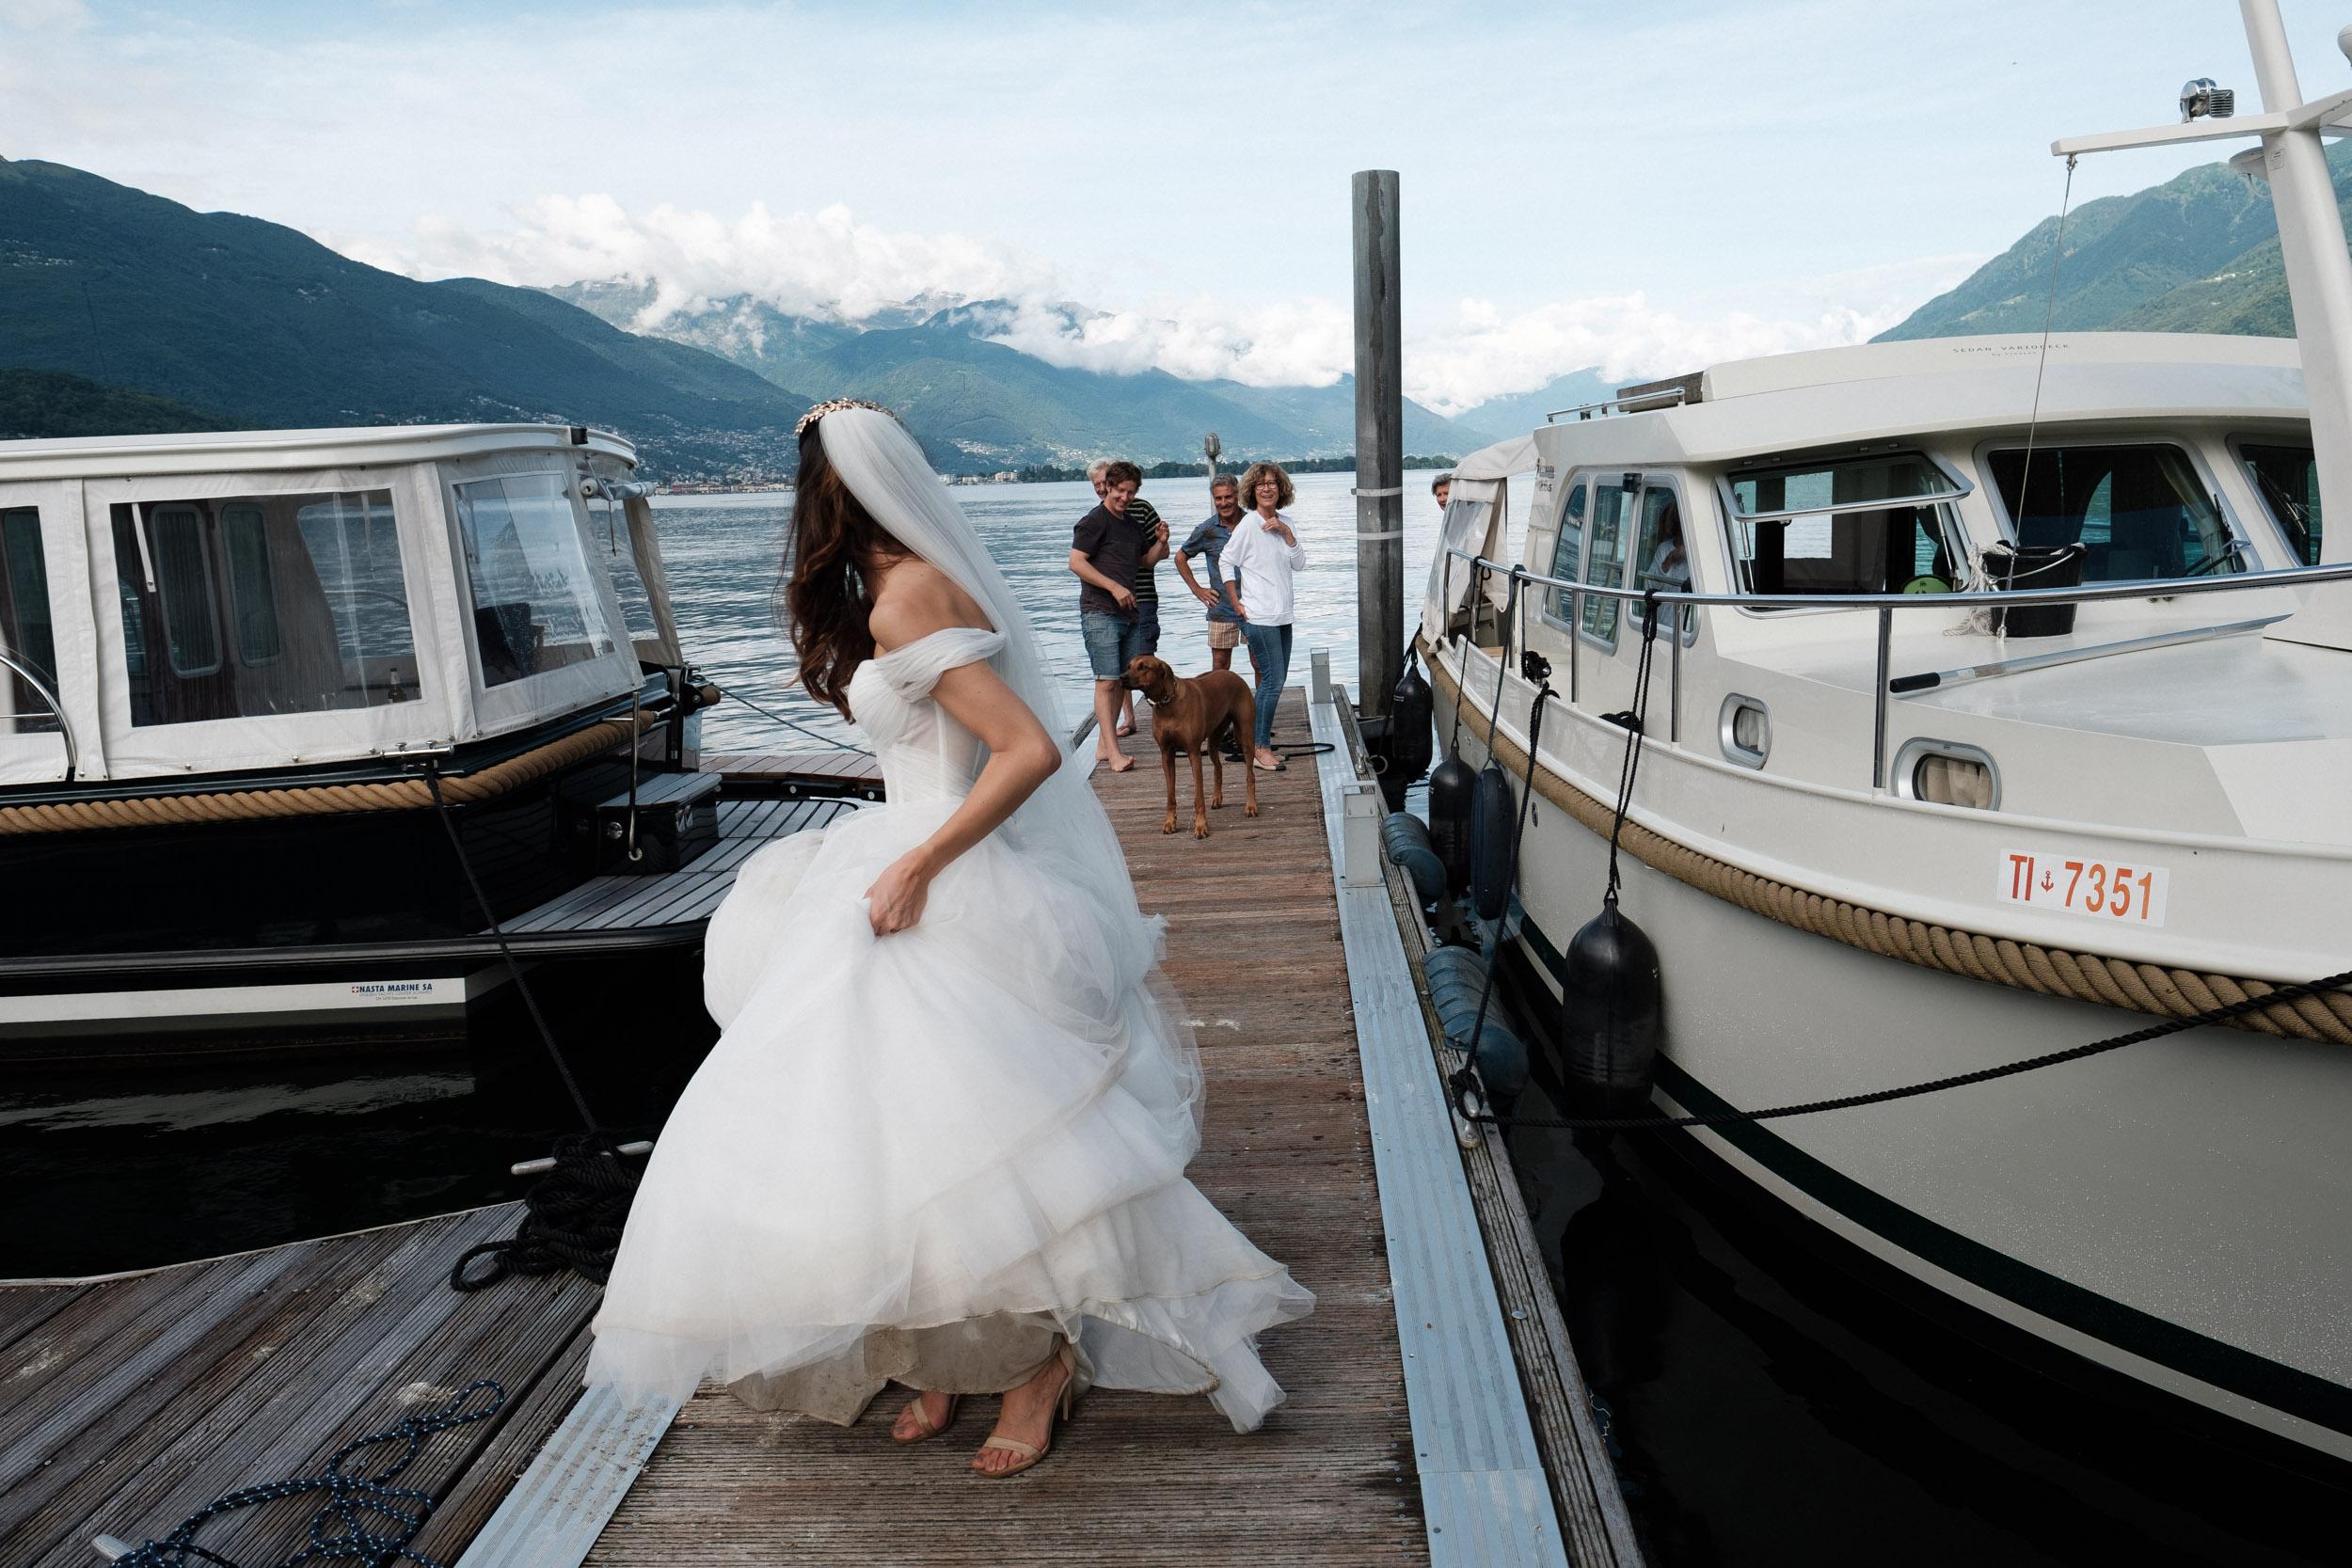 olivia-andreas-wedding-switzerland-379.jpg